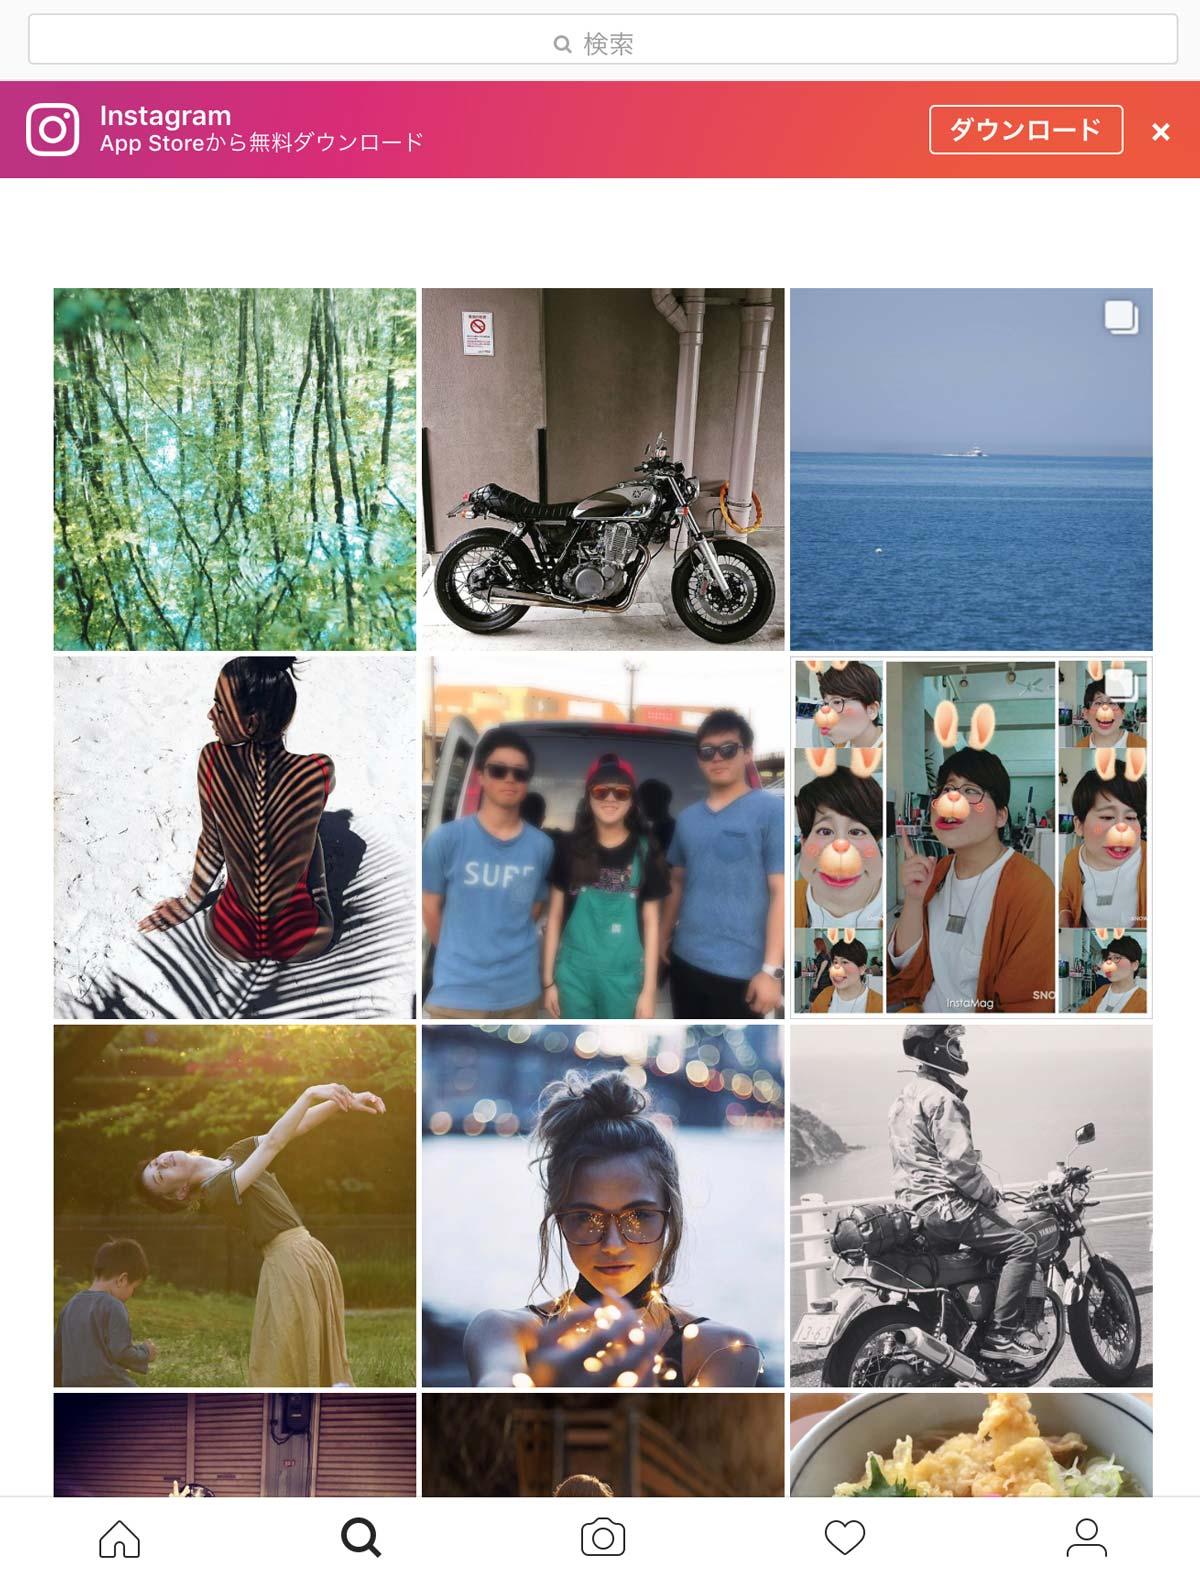 Instagram モバイルサイト